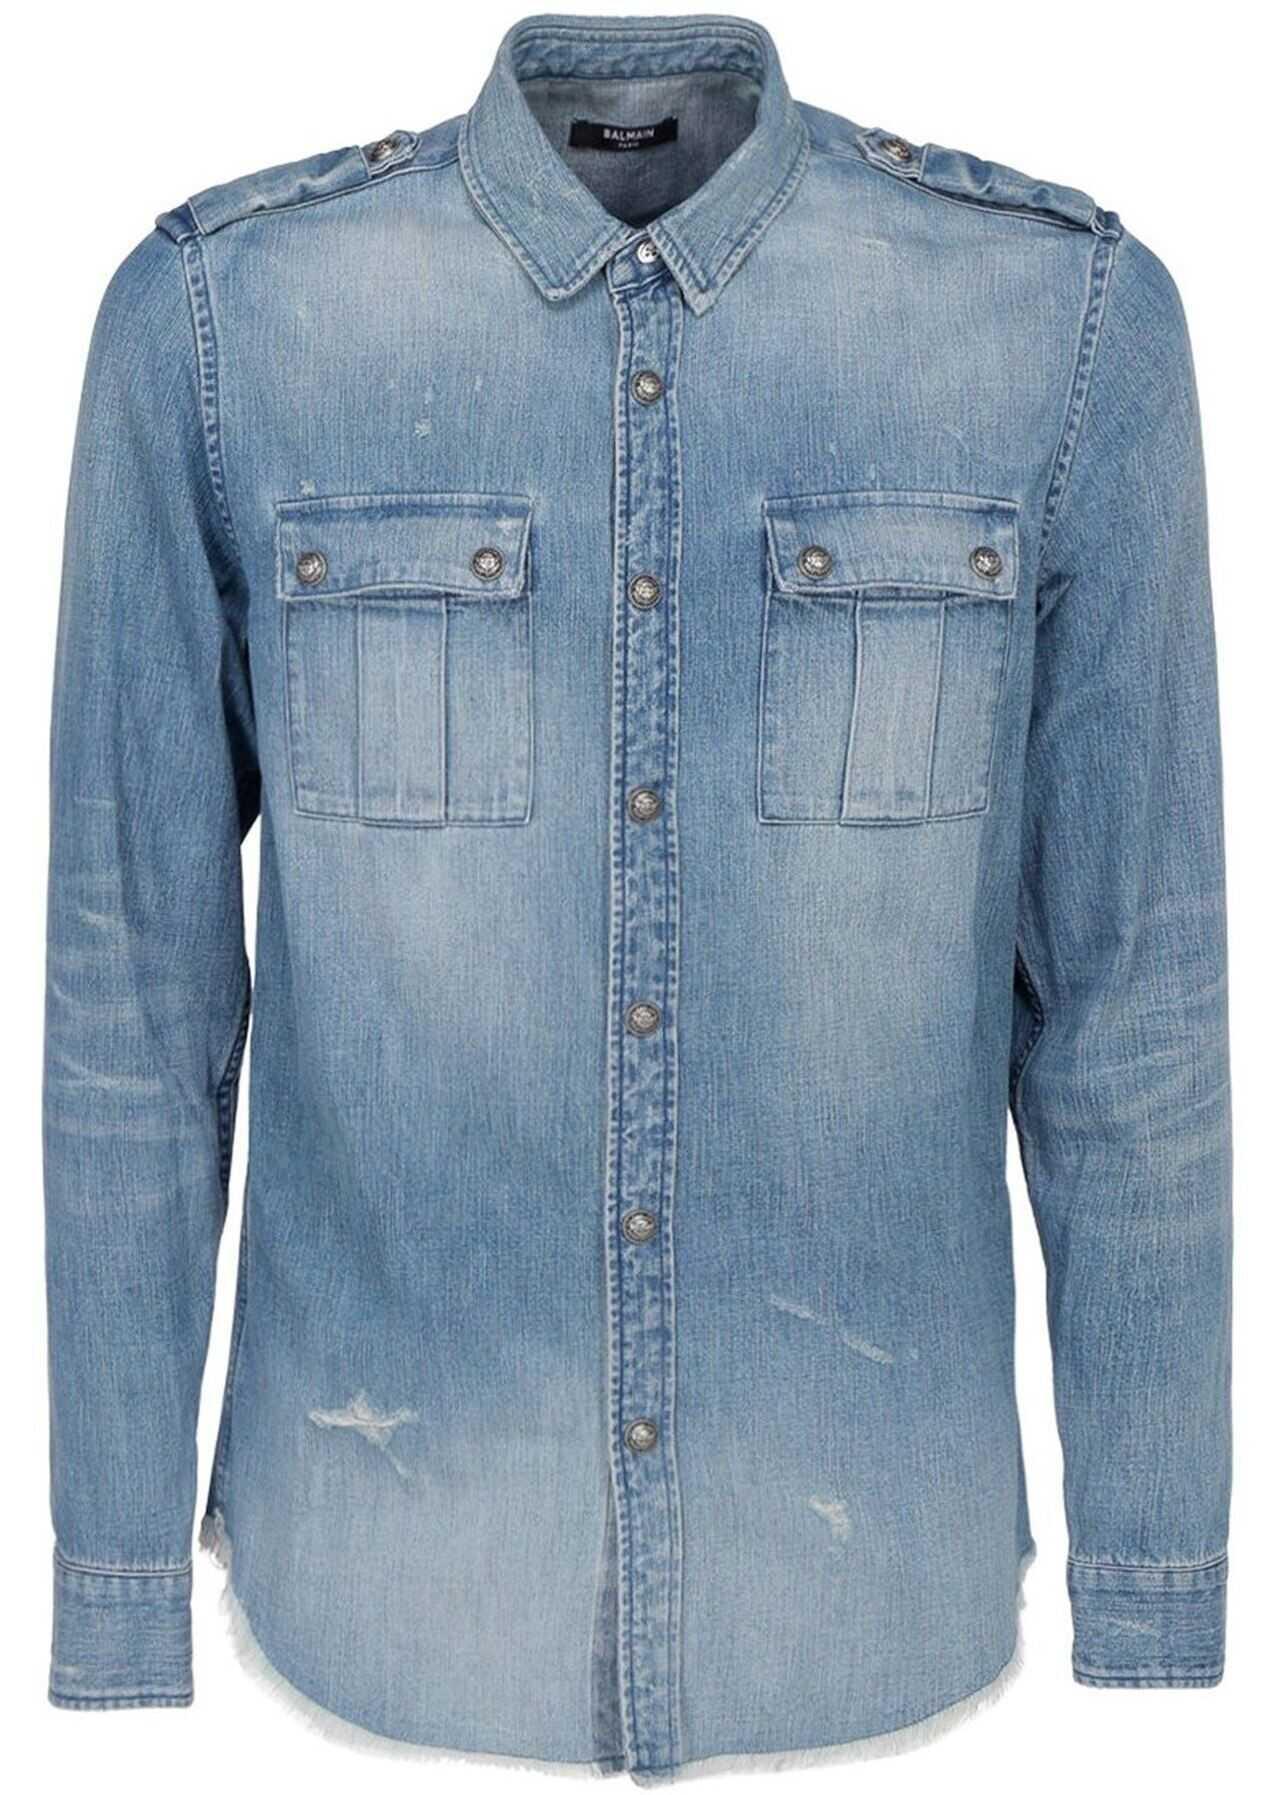 Balmain Denim Shirt In Light Blue Light Blue imagine